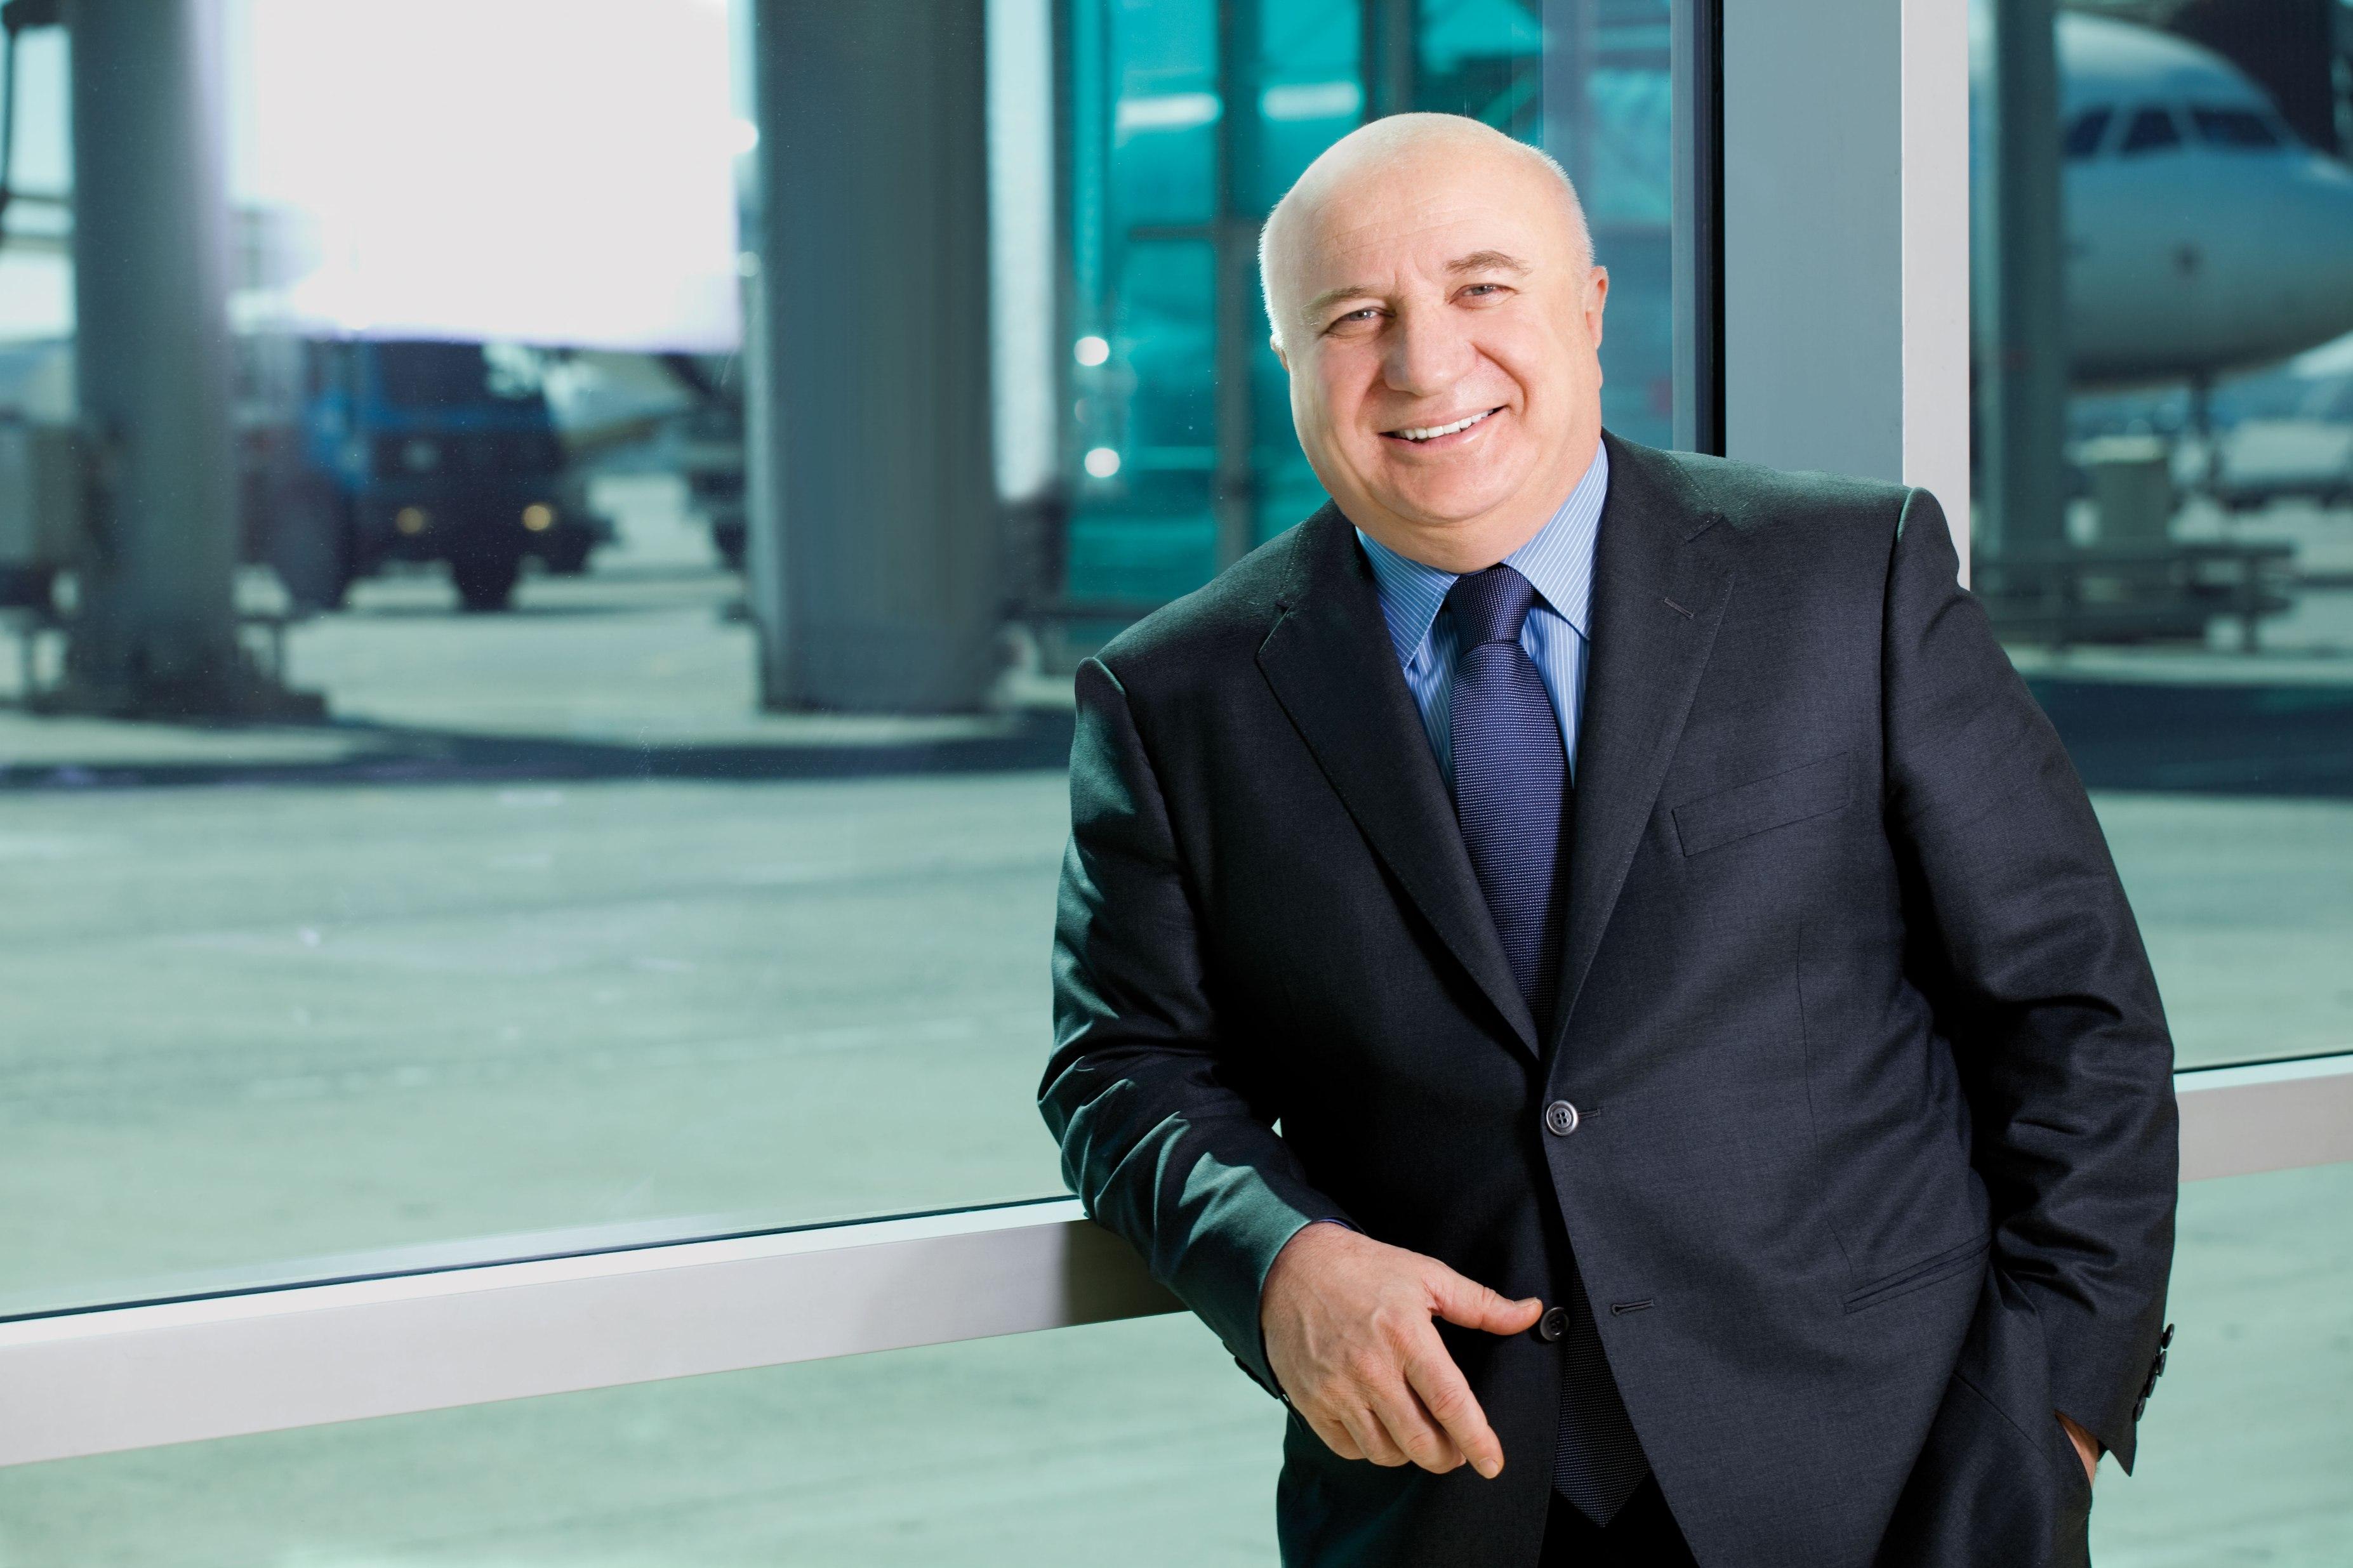 #11 Mustafa Sani Sener, CEO and President TAV Group